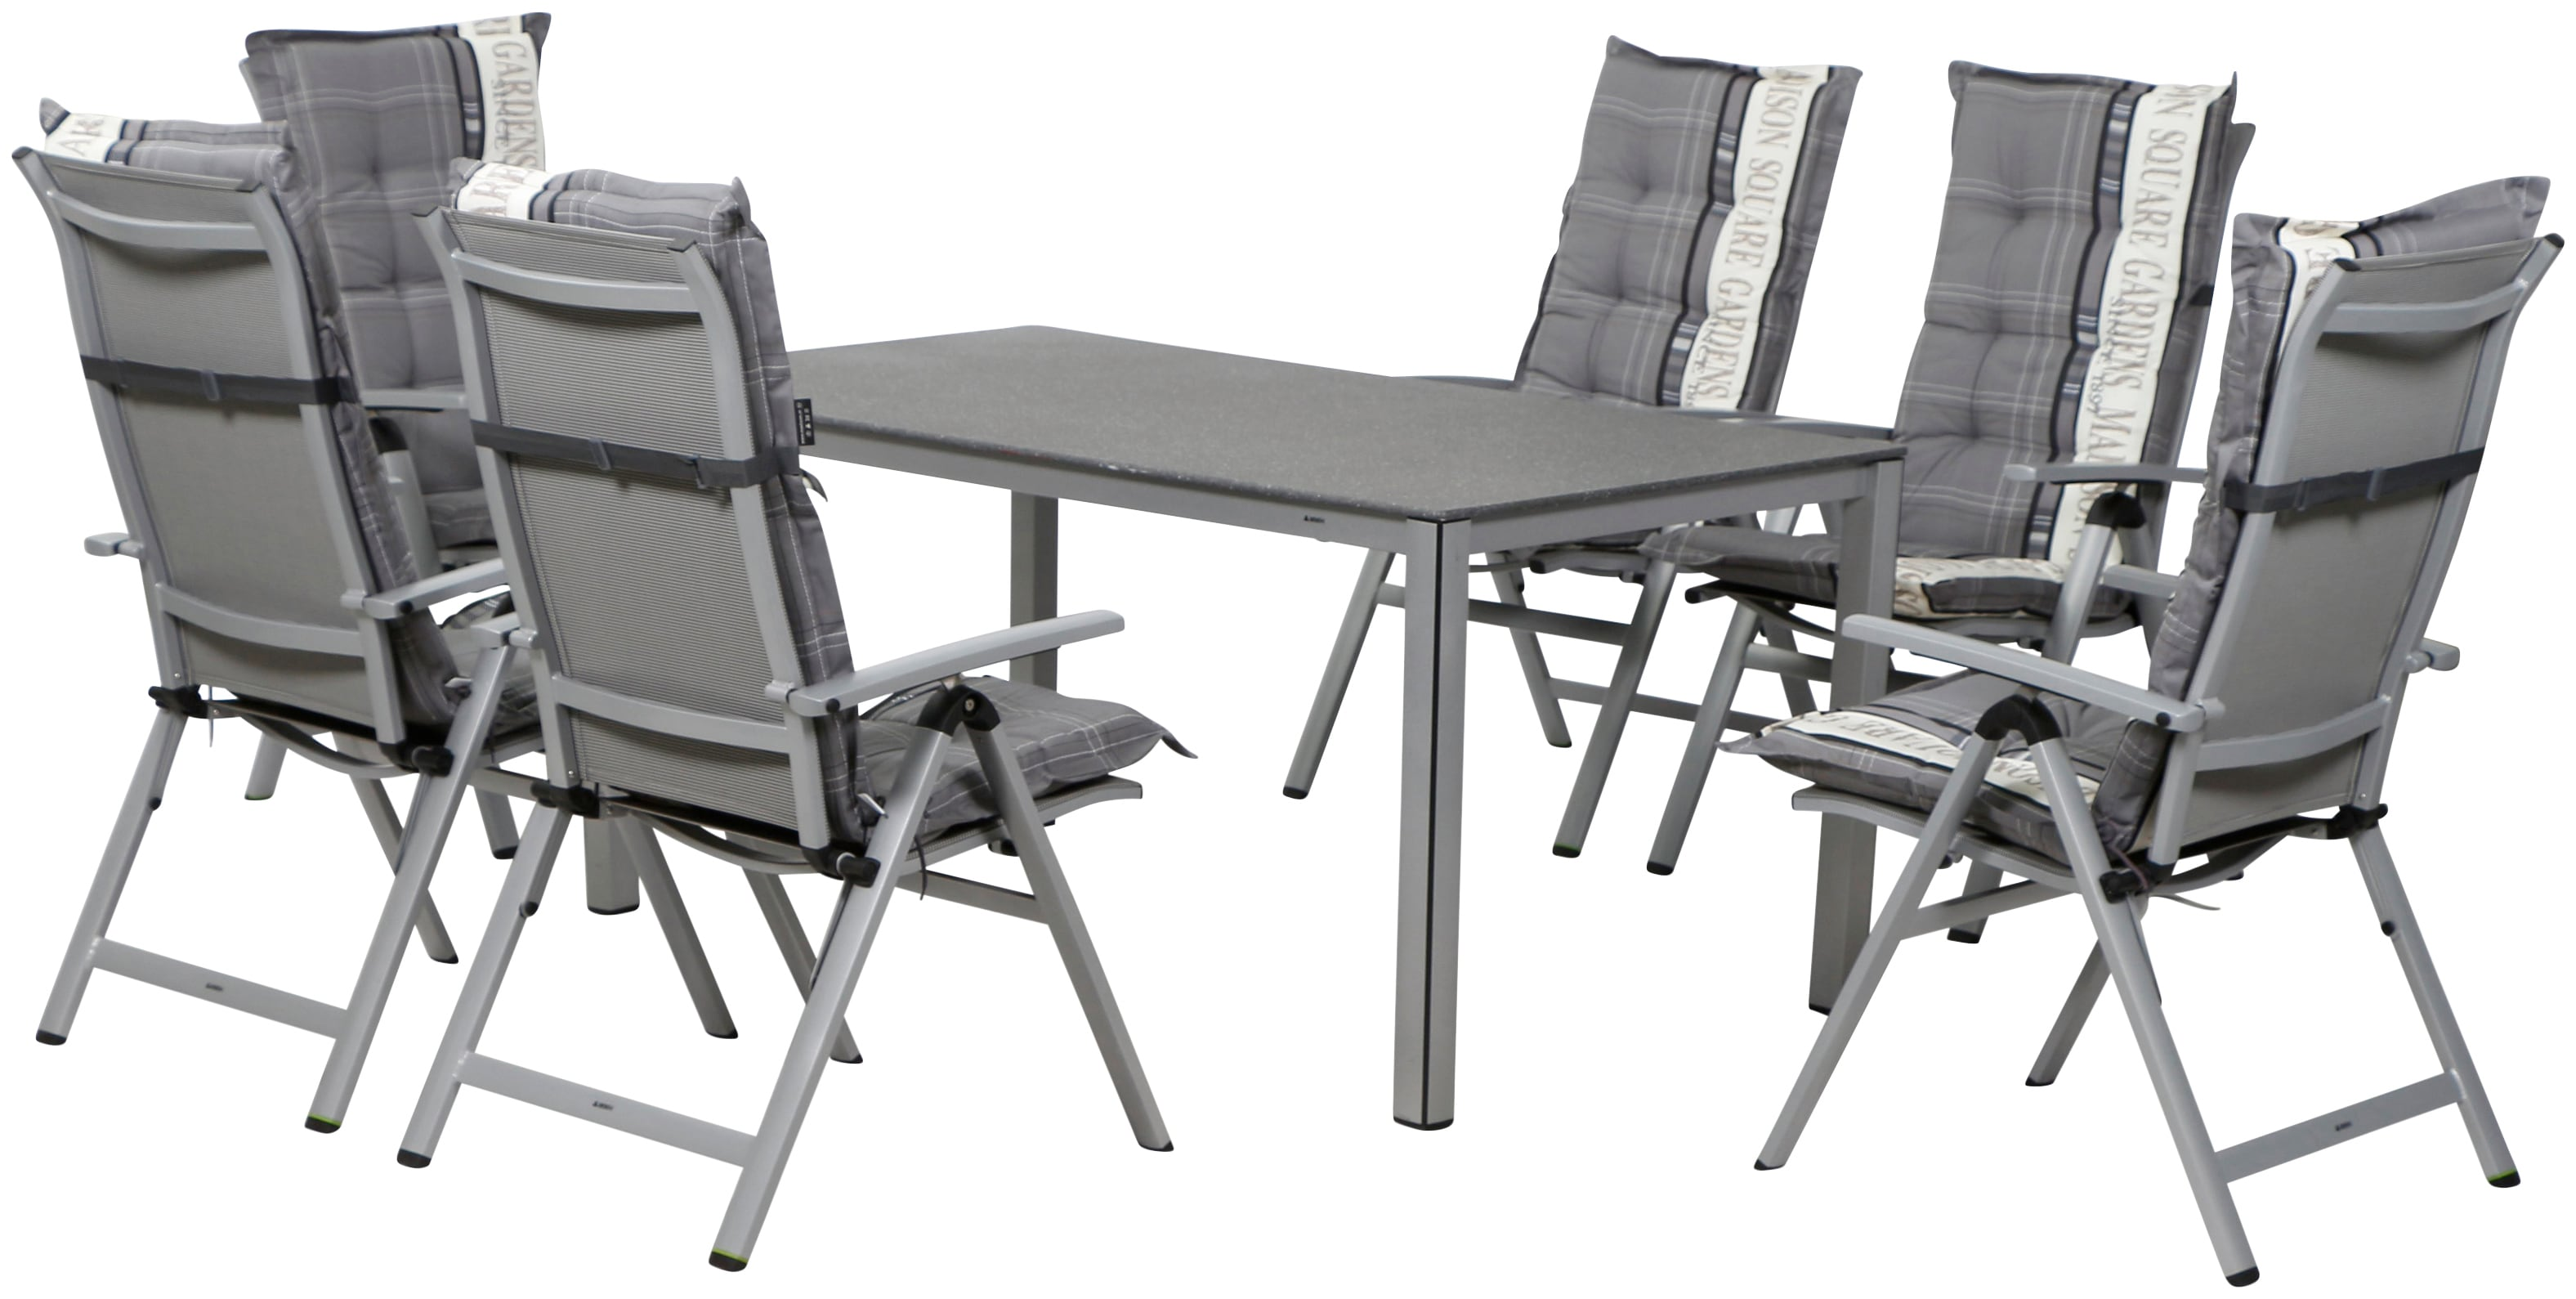 MWH Gartenmöbelset Fabulo 13tlg 6 Sessel Tisch 160x90 cm inkl Auflagen Aluminium